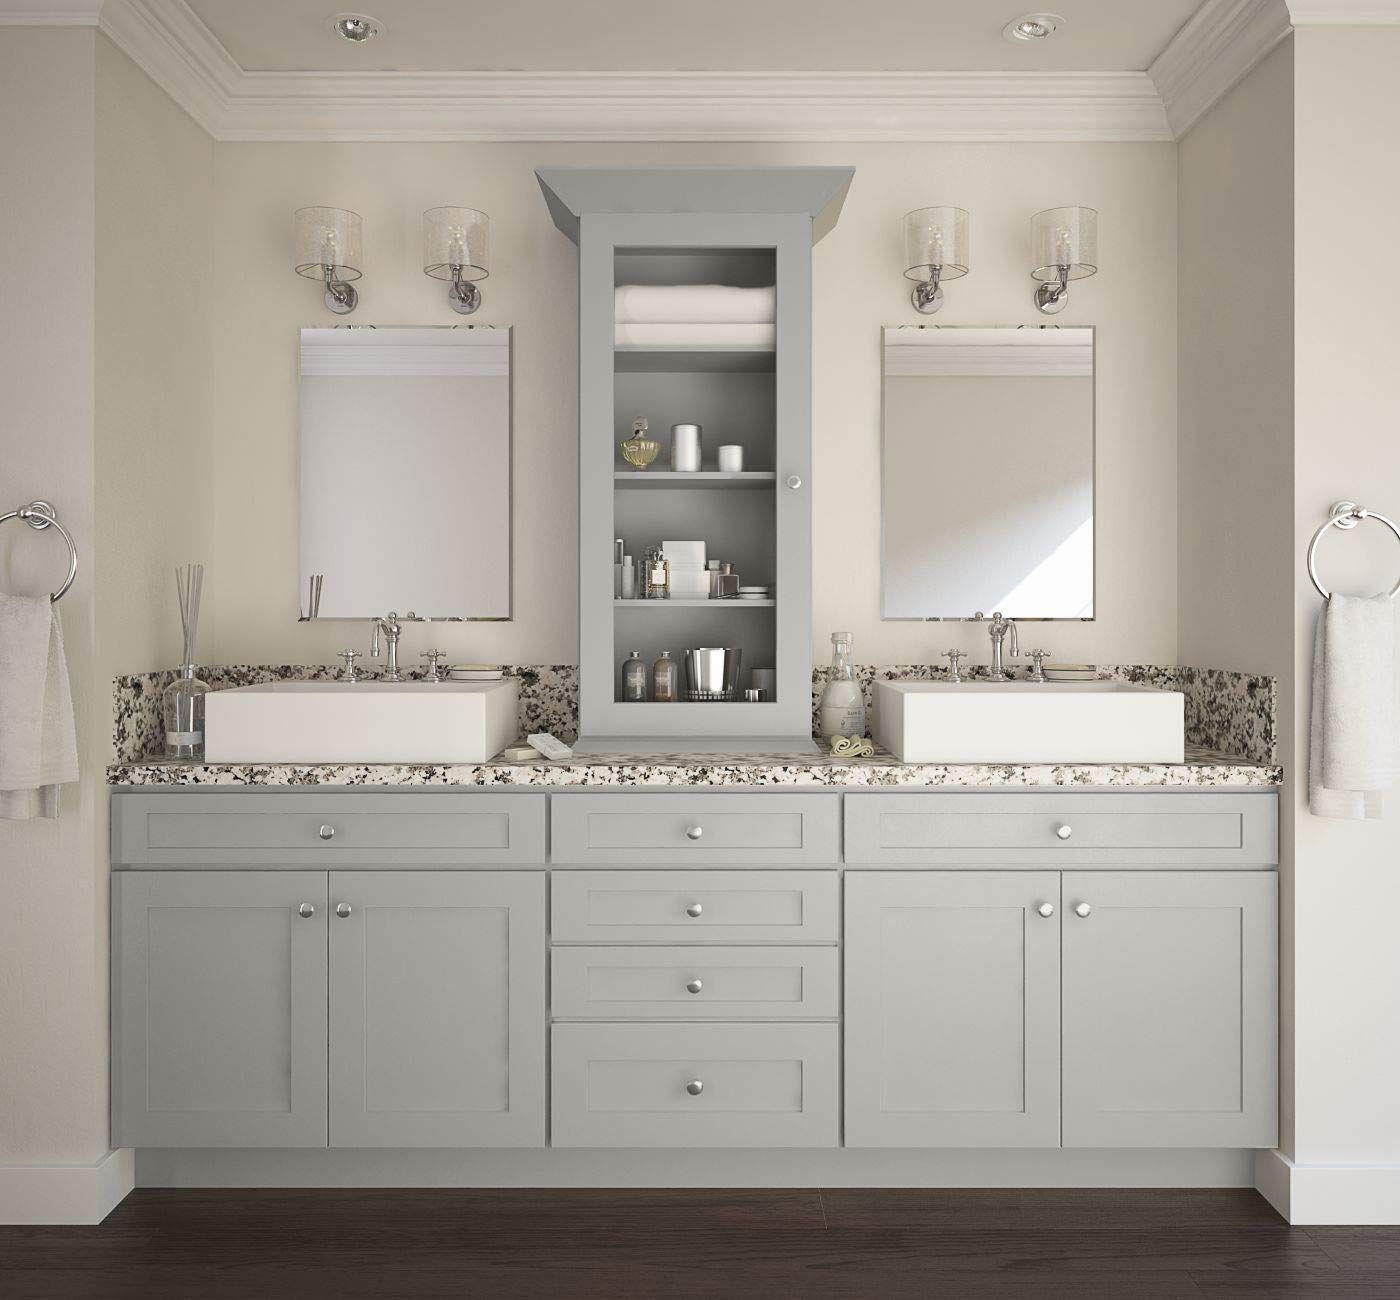 Amazon Com Shaker Dove Light Grey Cabinet Solid Wood Construction